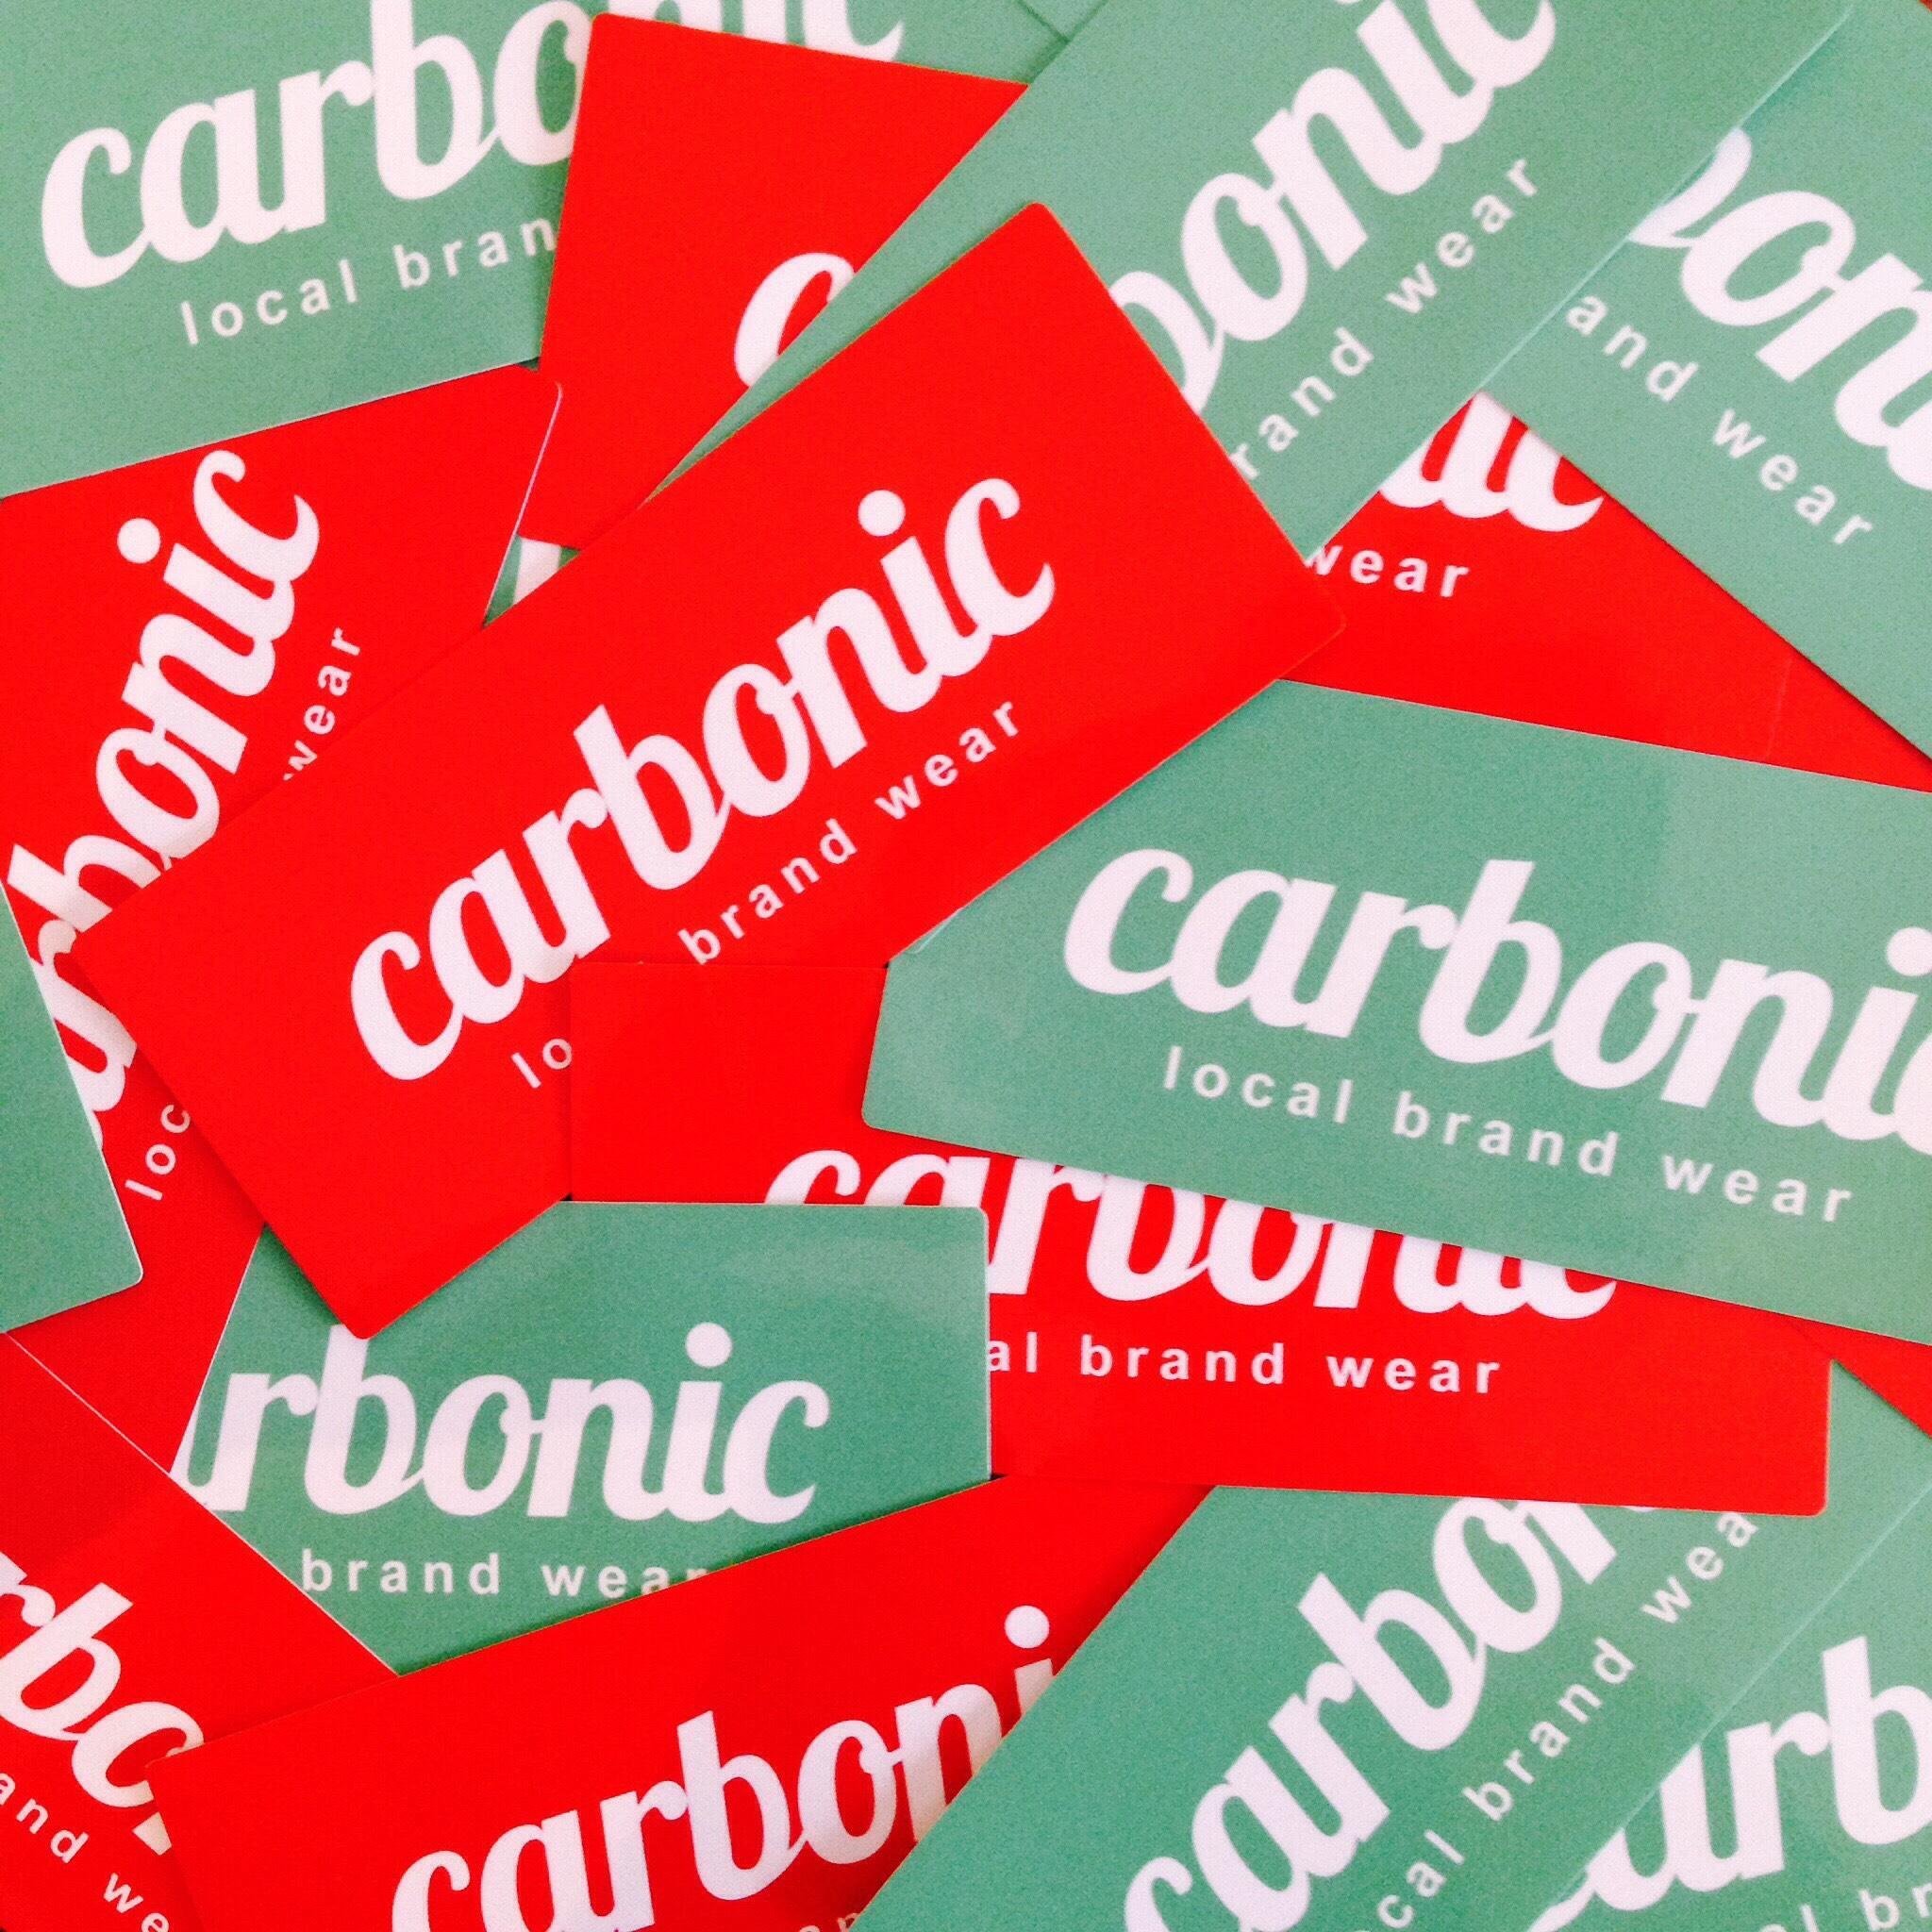 carbonic LOGO sticker